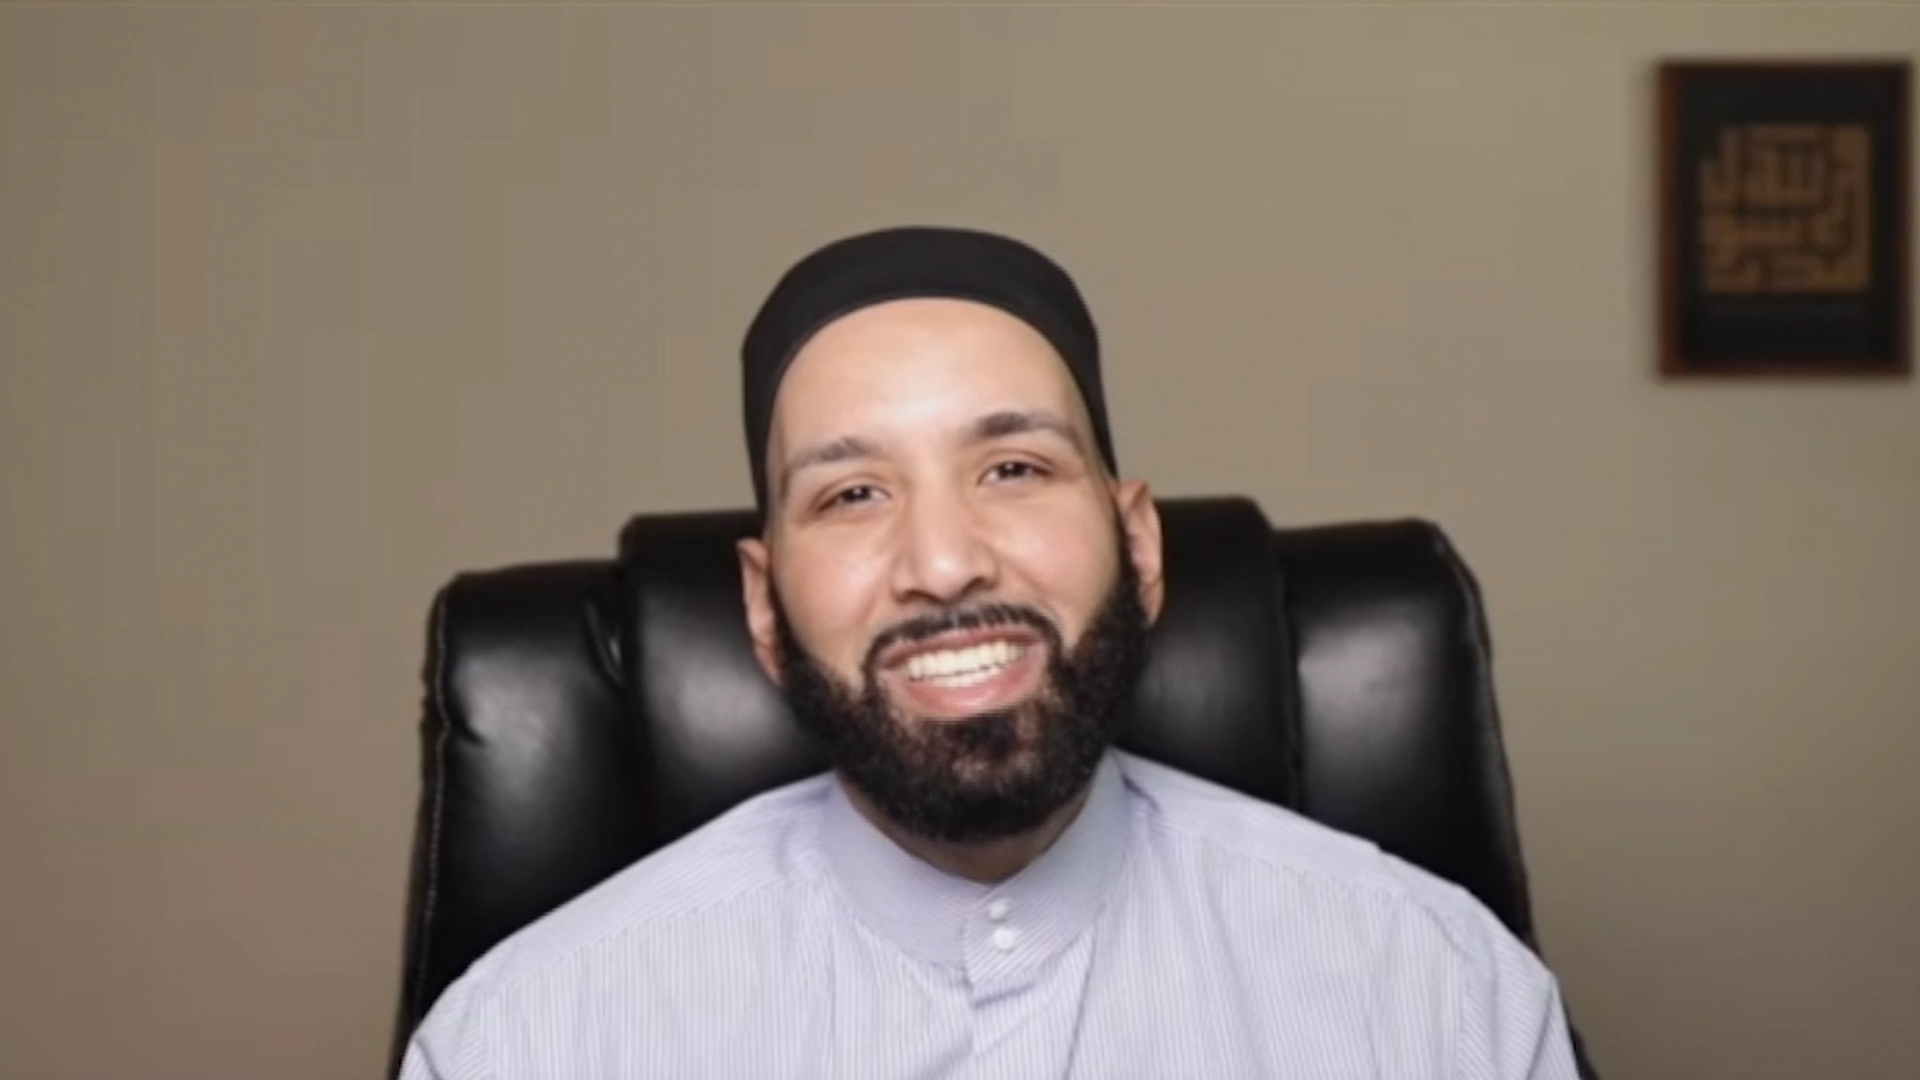 Picture of Omar Suleiman